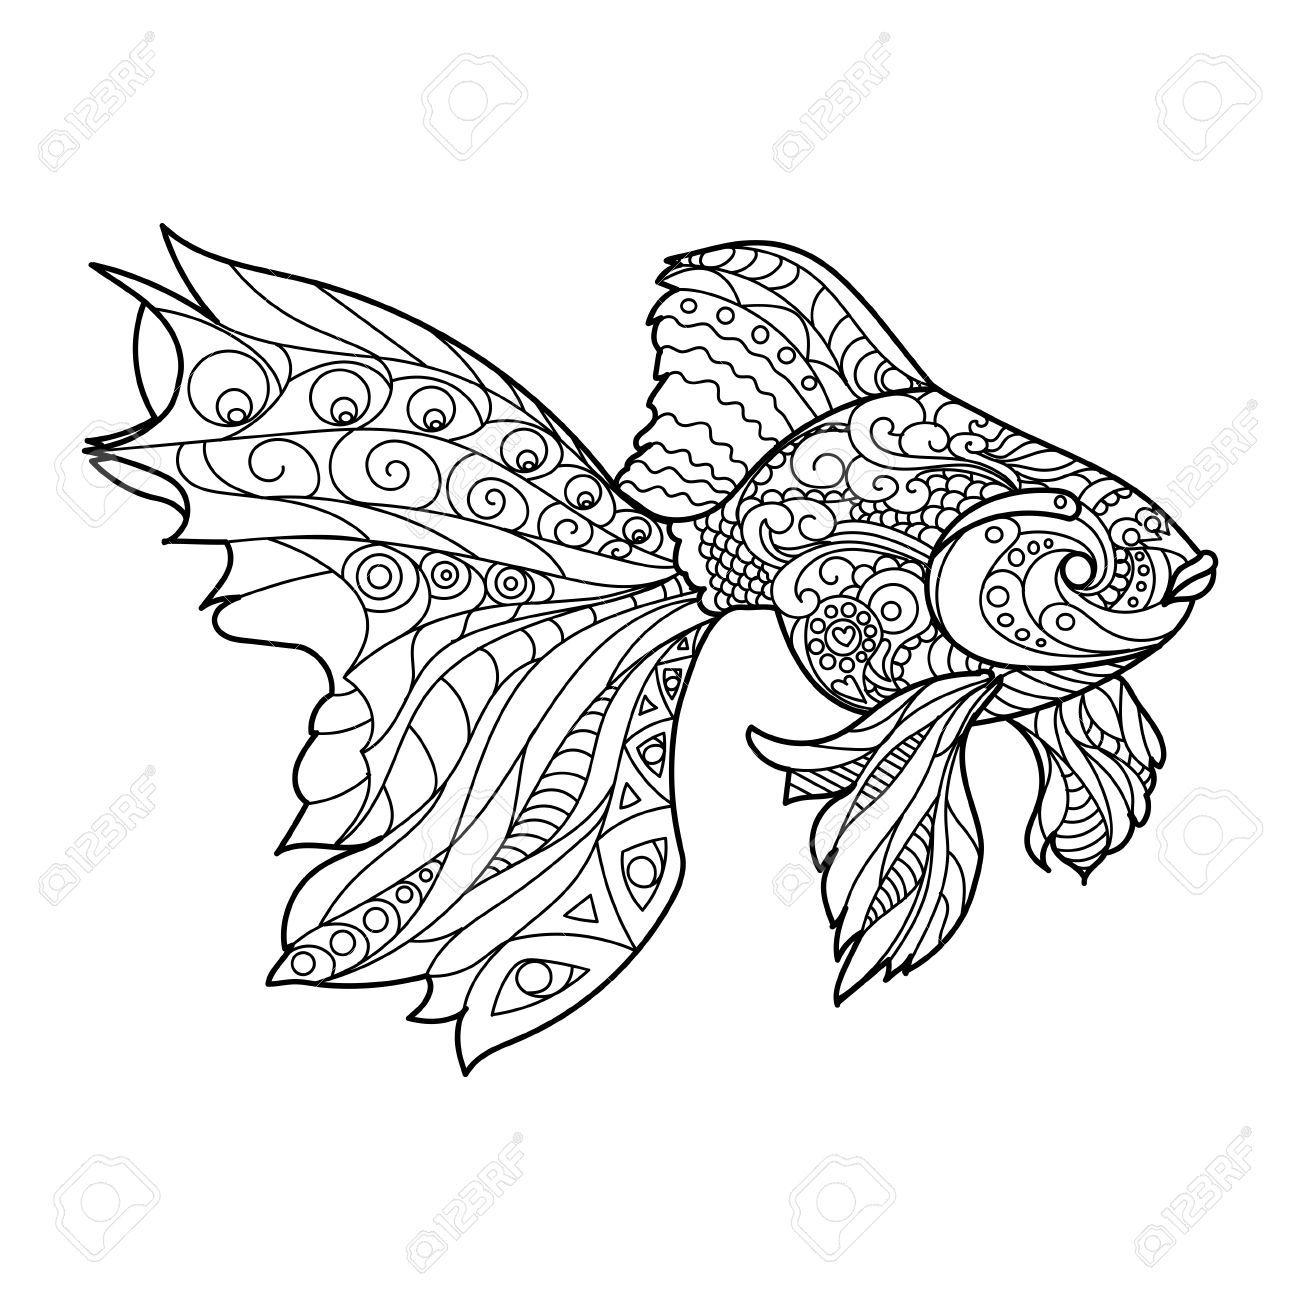 Mandala Fish Coloring Pages Coloring Books Fish Coloring Page